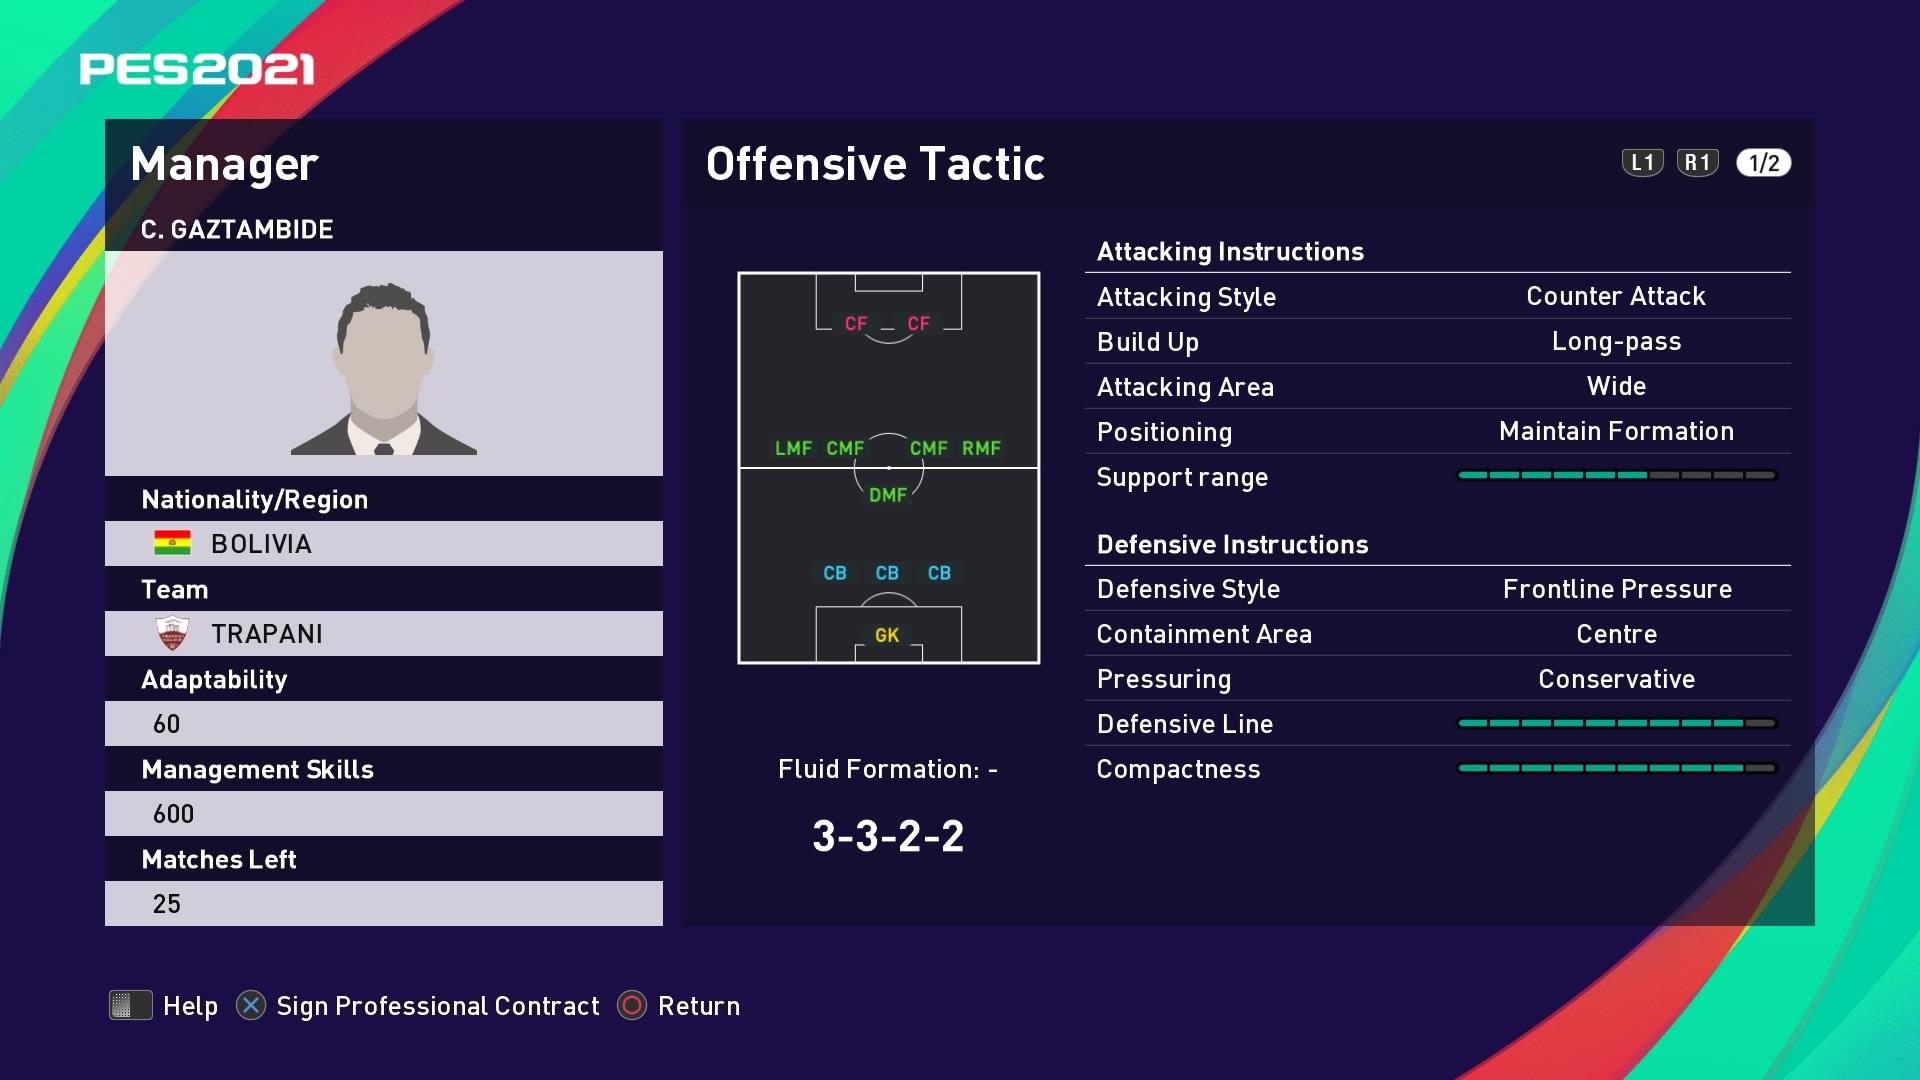 C. Gaztambide Offensive Tactic in PES 2021 myClub